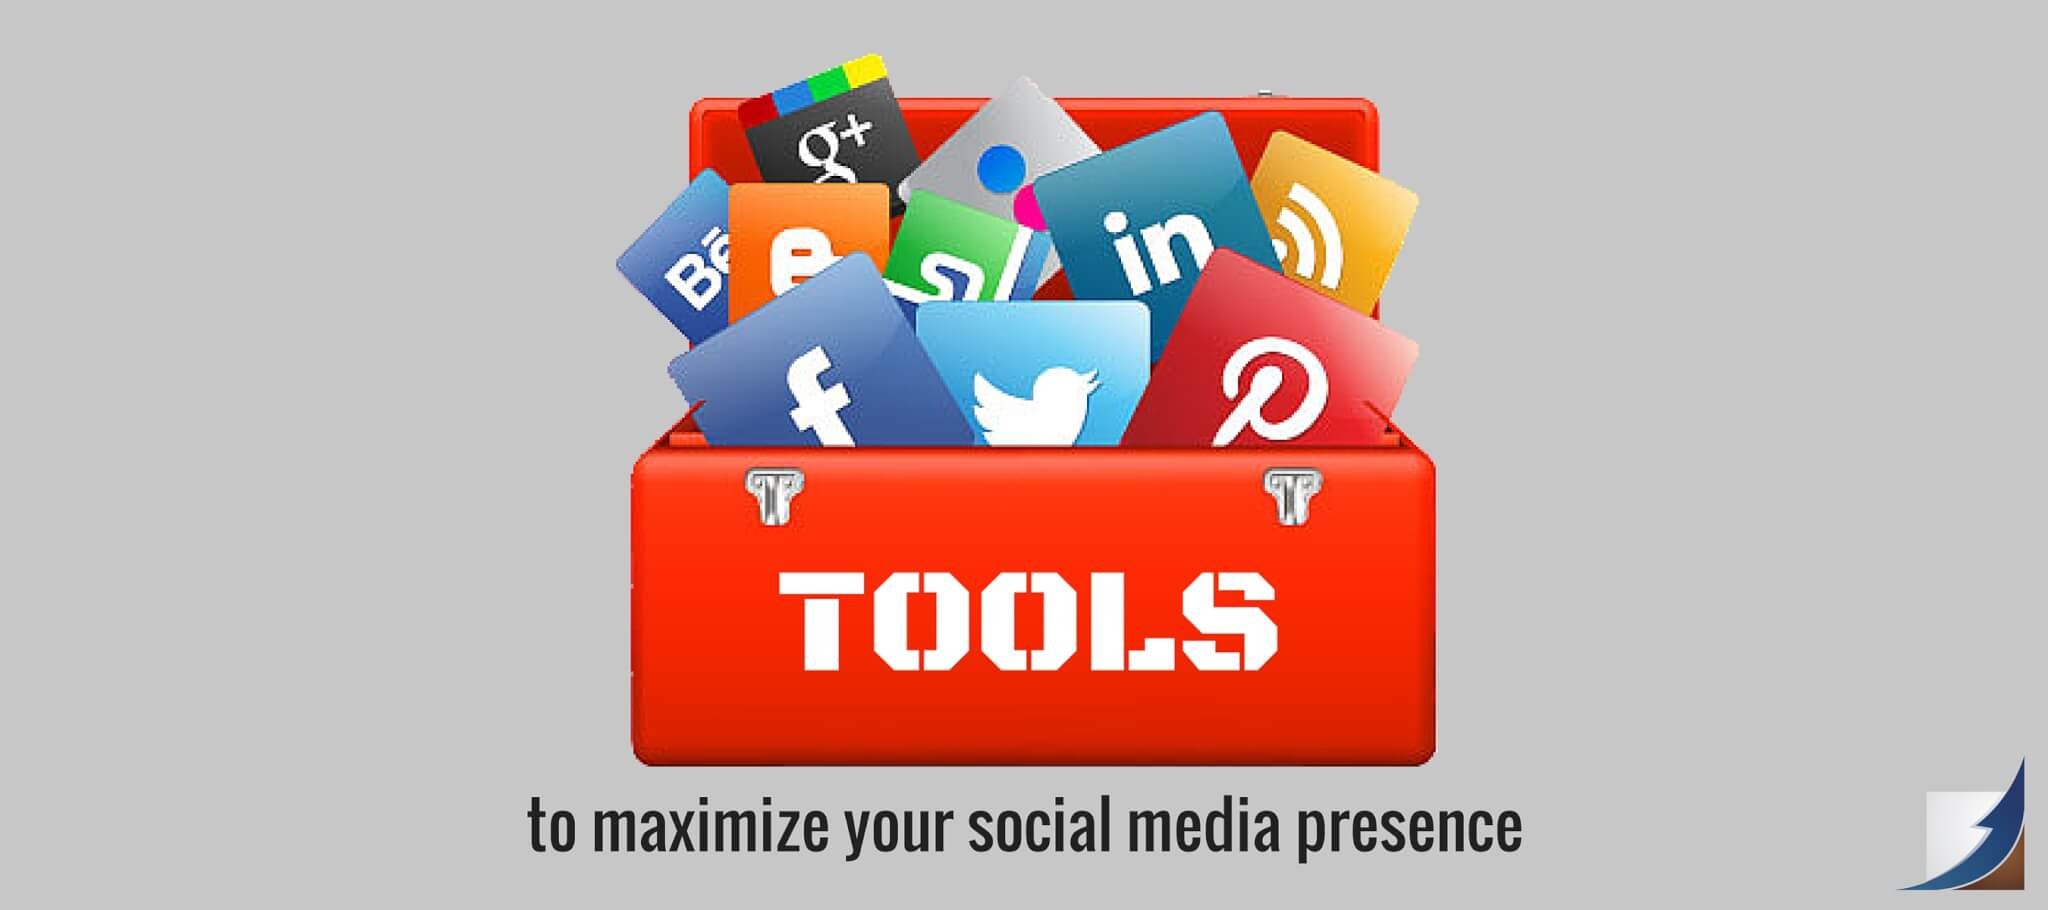 Tools to Maximize Your Social Media Presence